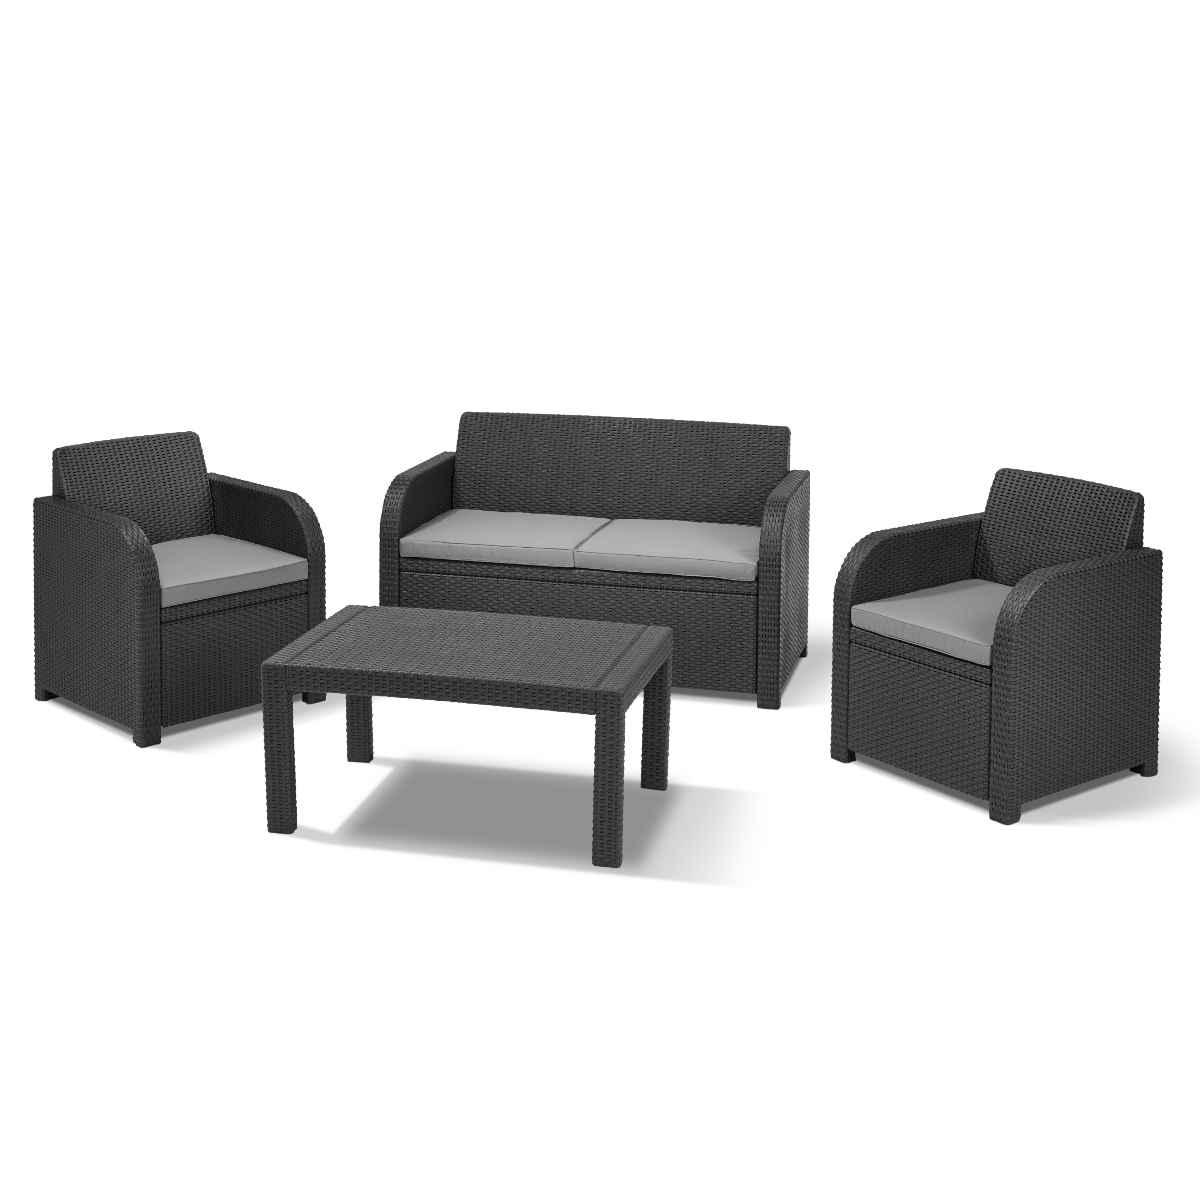 Norfolk Leisure Oklahoma Outdoor Sofa Set - Grey